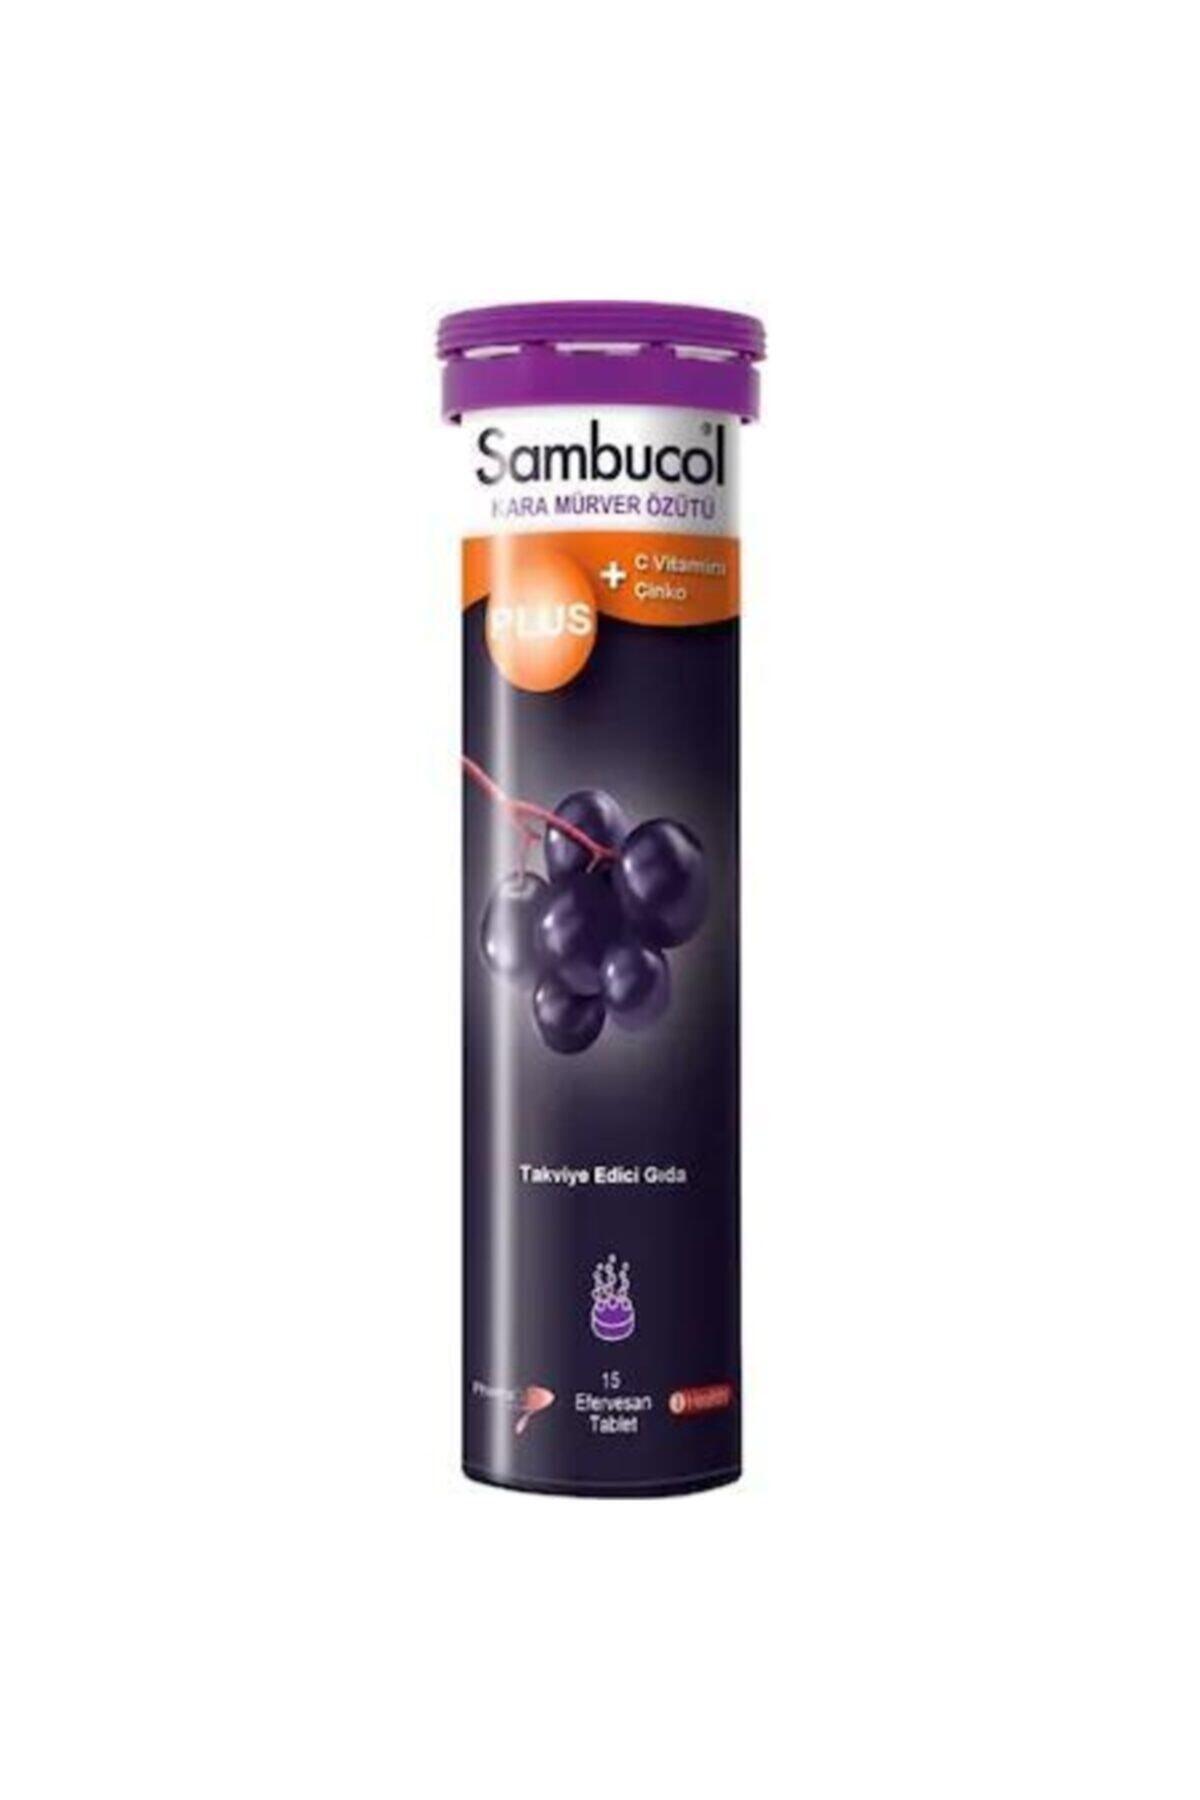 Sambucol Plus Effervesan Tablet 1